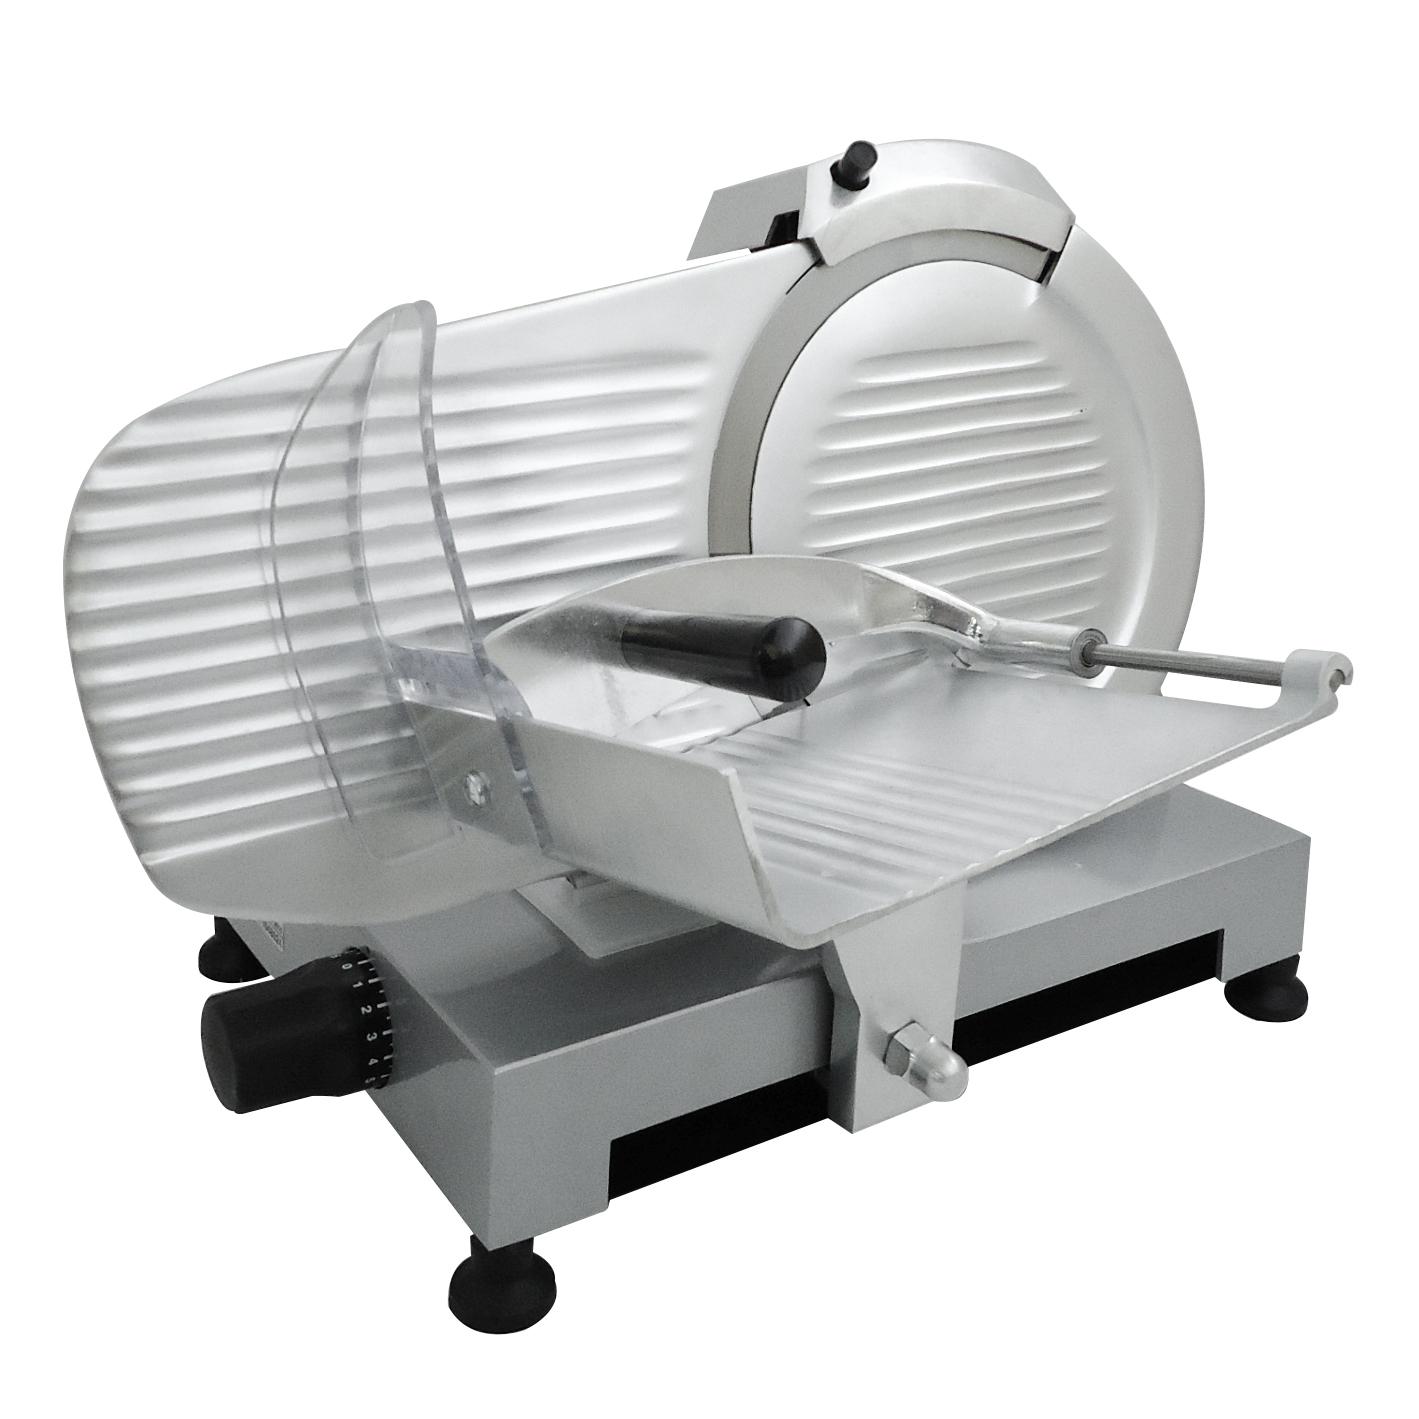 ESSEDUE 300 ECO Ζαμπονομηχανή Πλάγιας Κοπής Με Ιμάντες - Διάμετρος Μαχαιριού: 30 black week προσφορές   ζαμπονομηχανές  επαγγελματικός εξοπλισμός   συσκευές επεξ